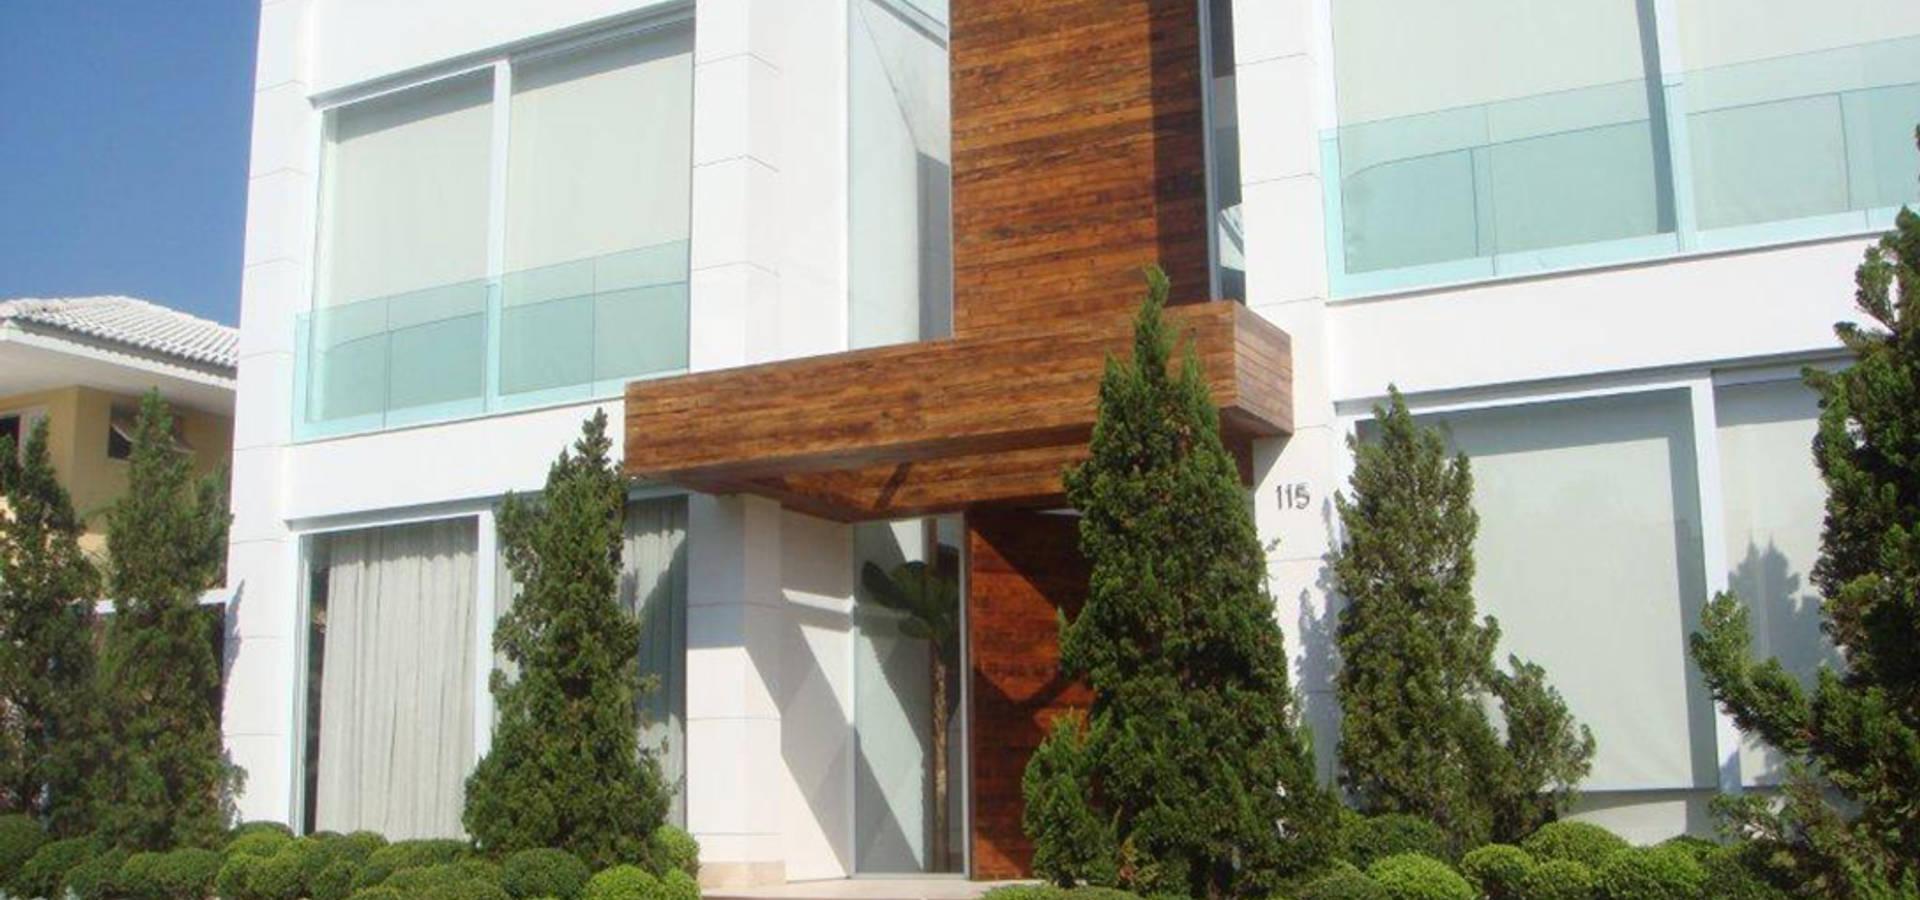 Renata Esbroglio Arquitetura